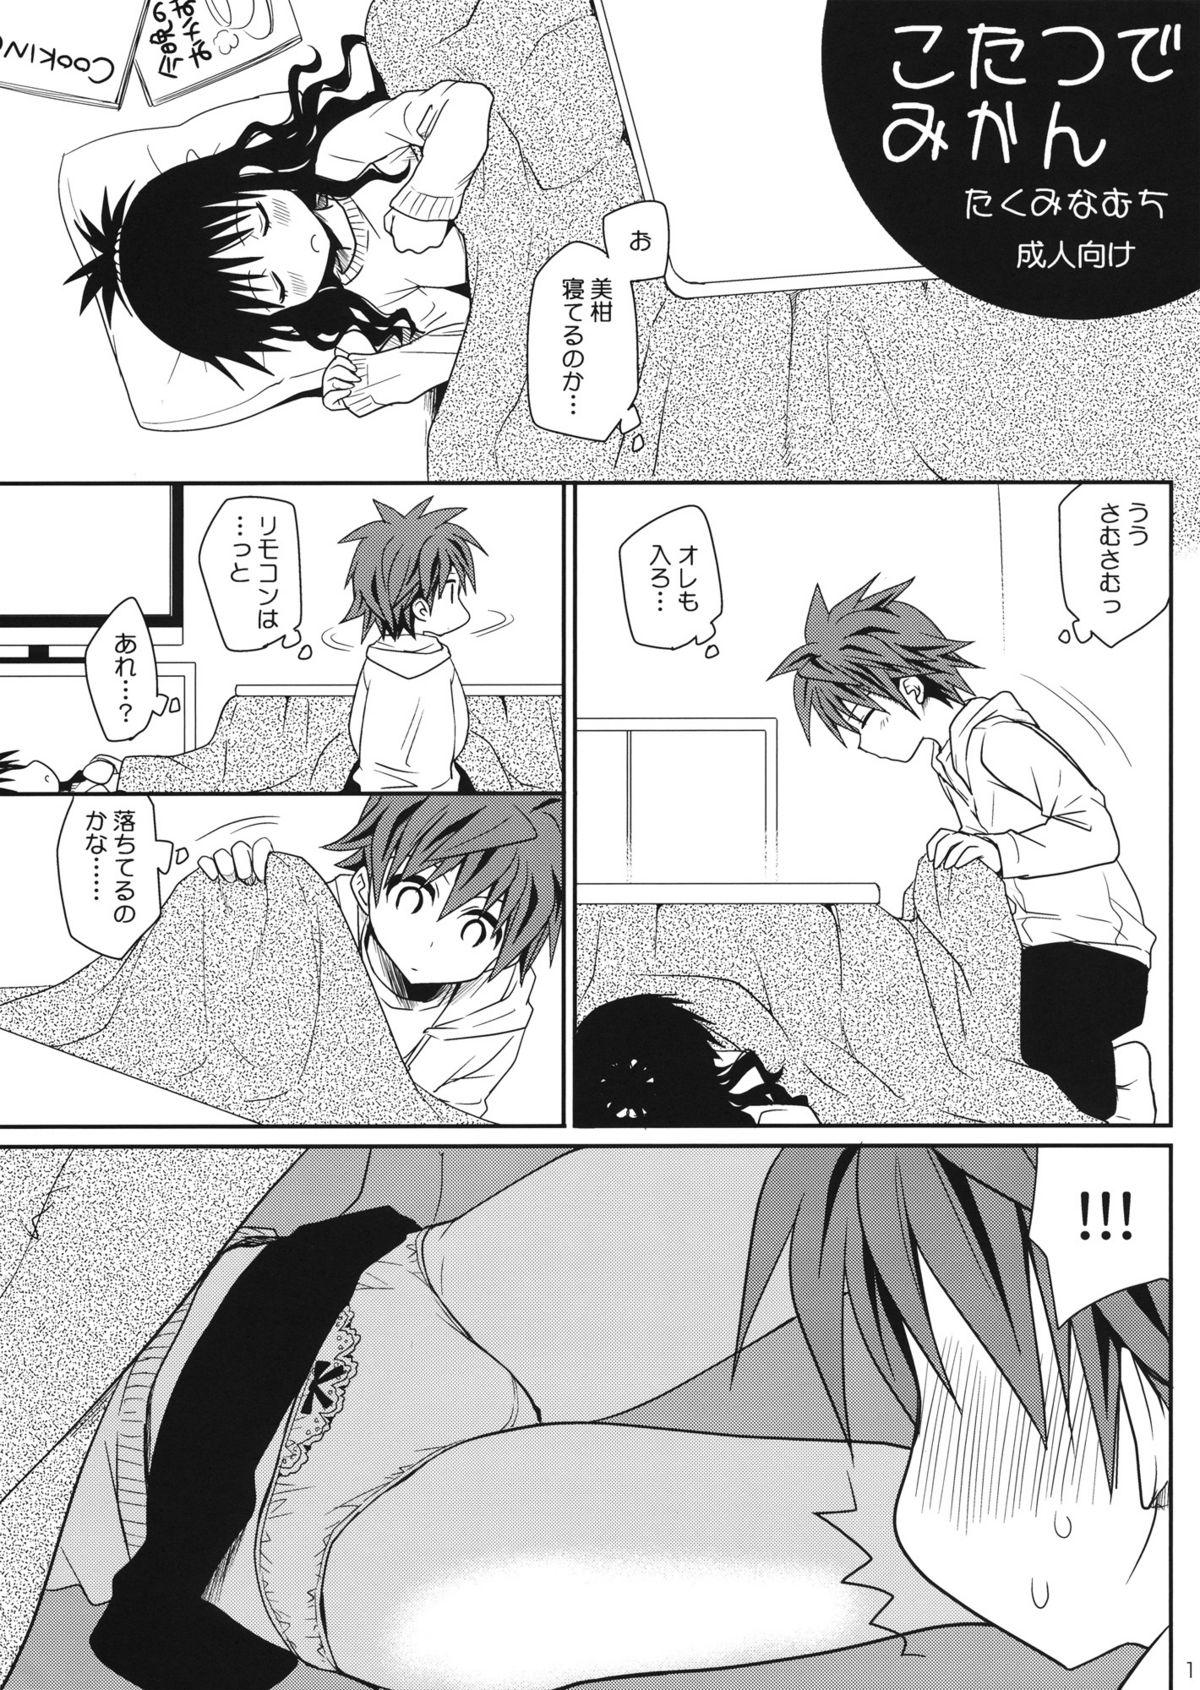 Kotatsu de Mikan 0